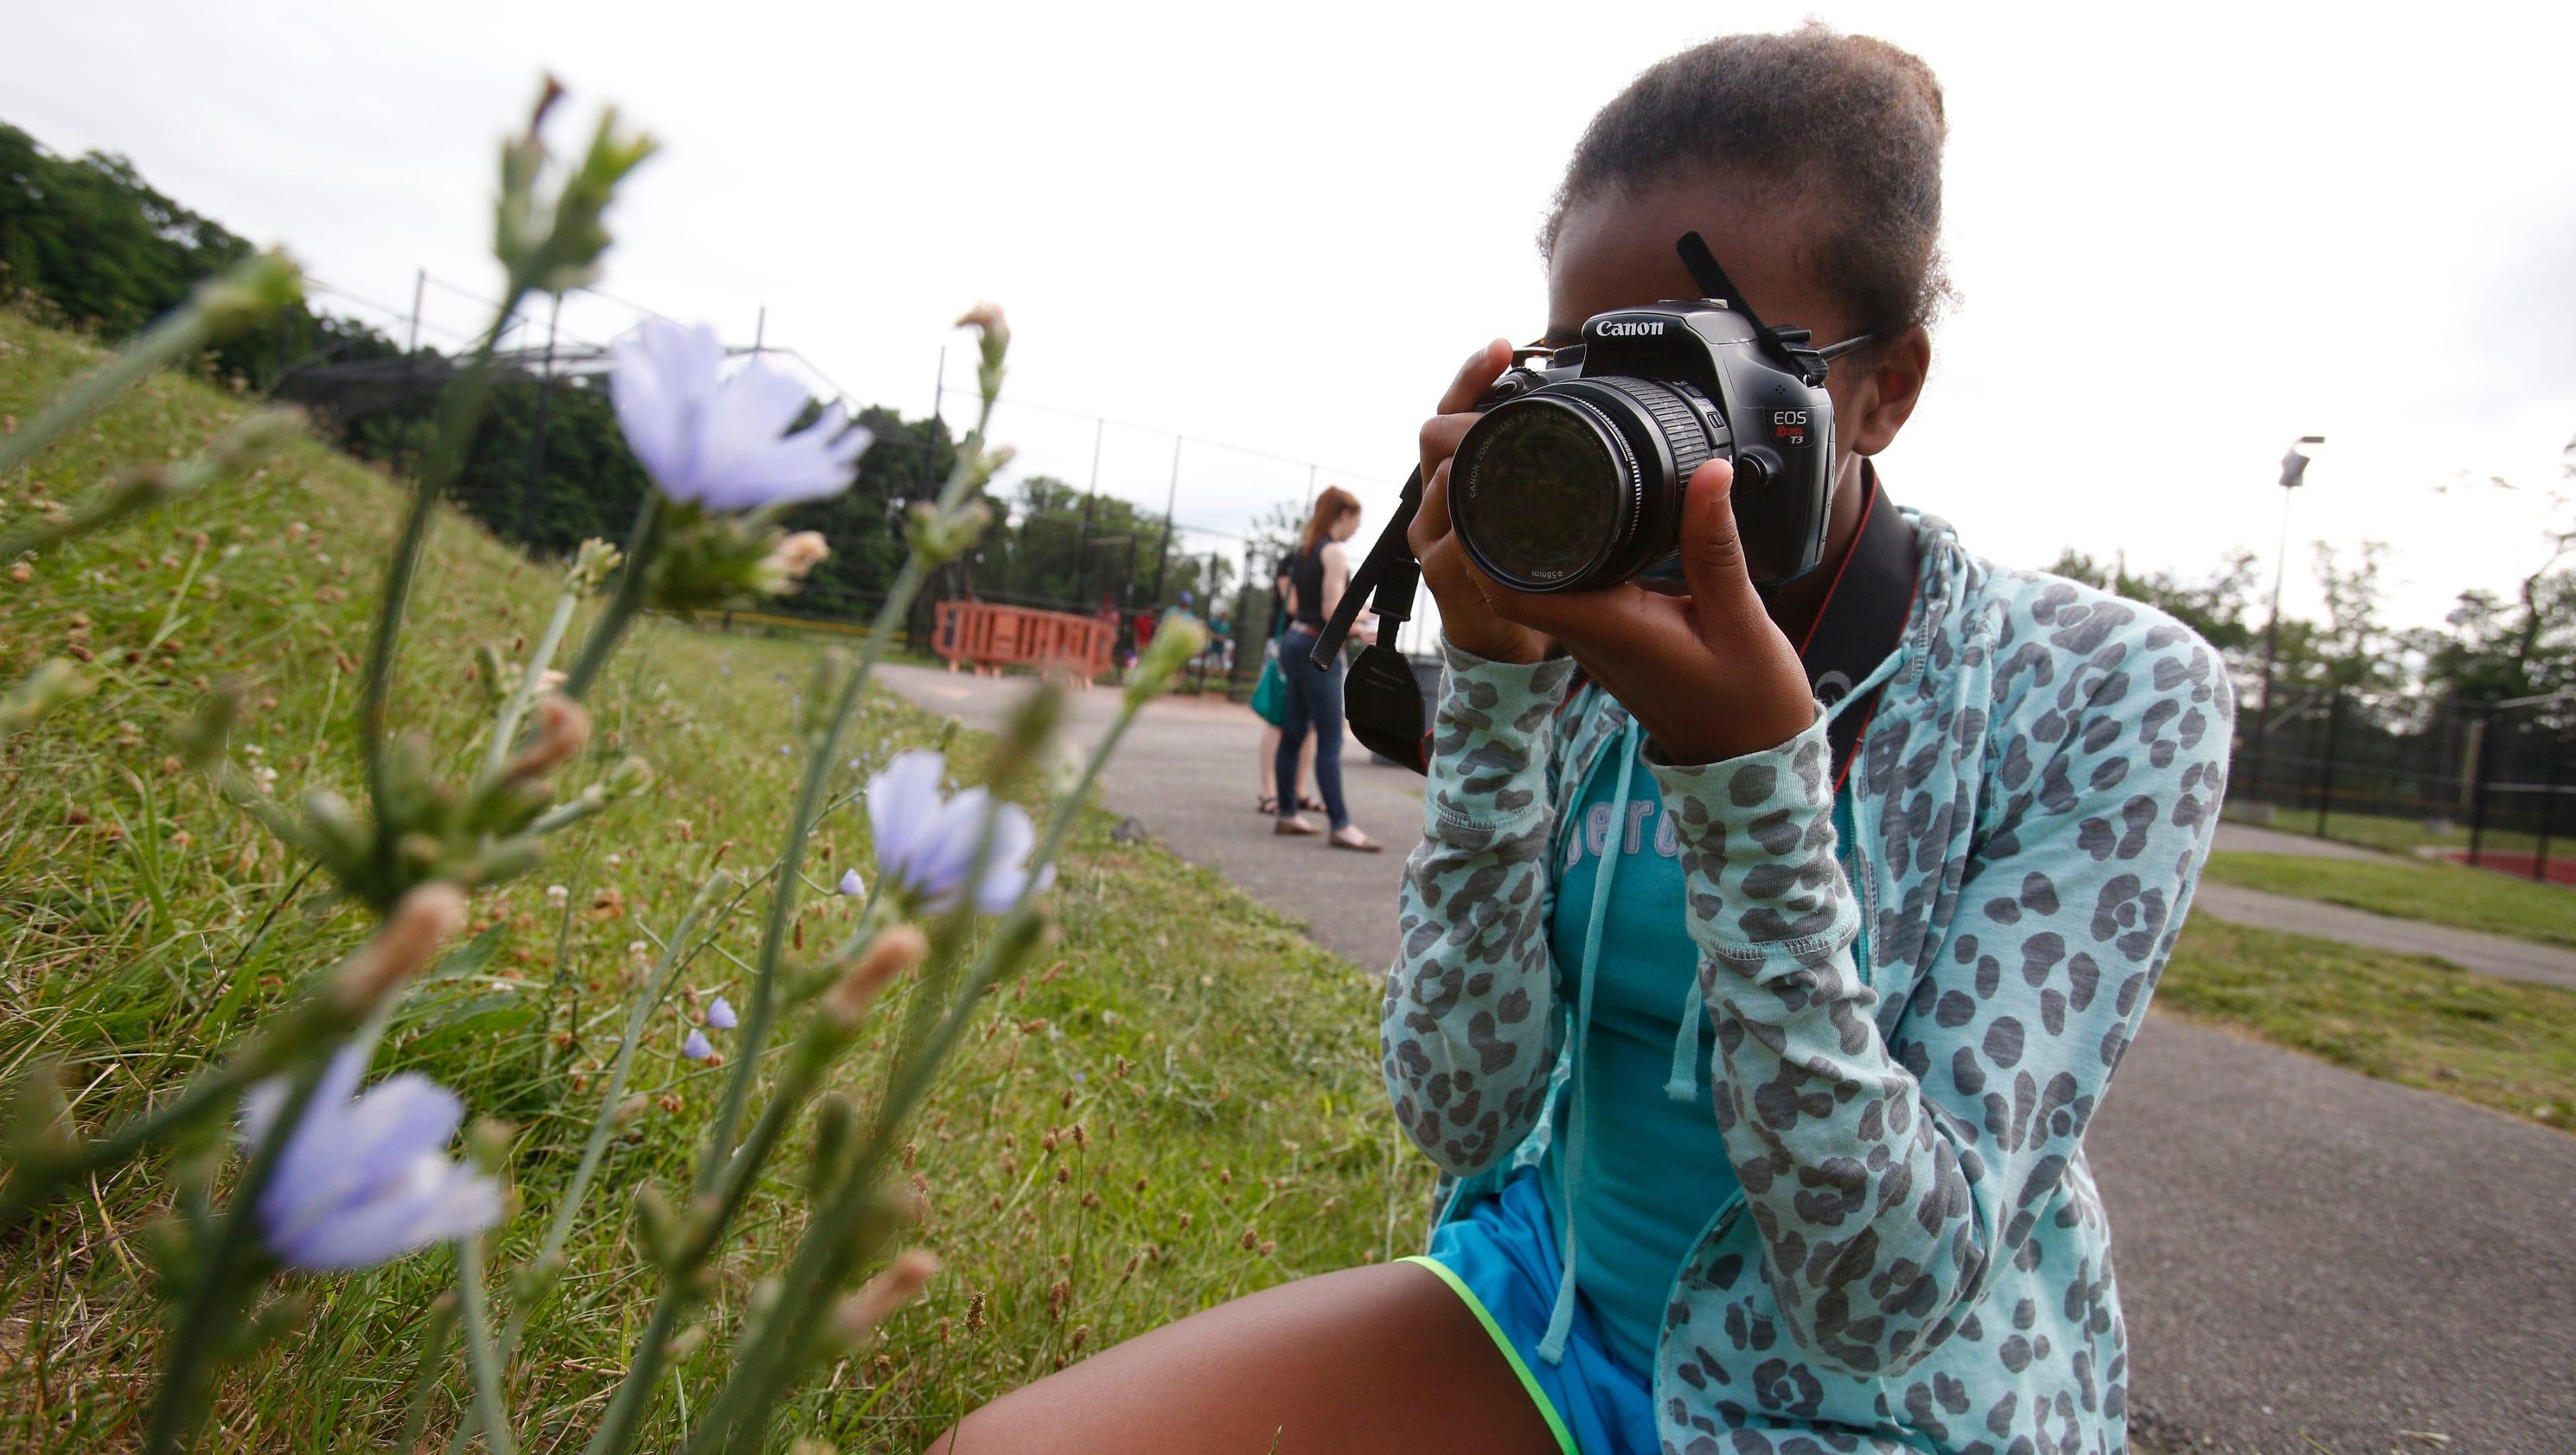 Cameras, robots engage kids at Ossining schools camp